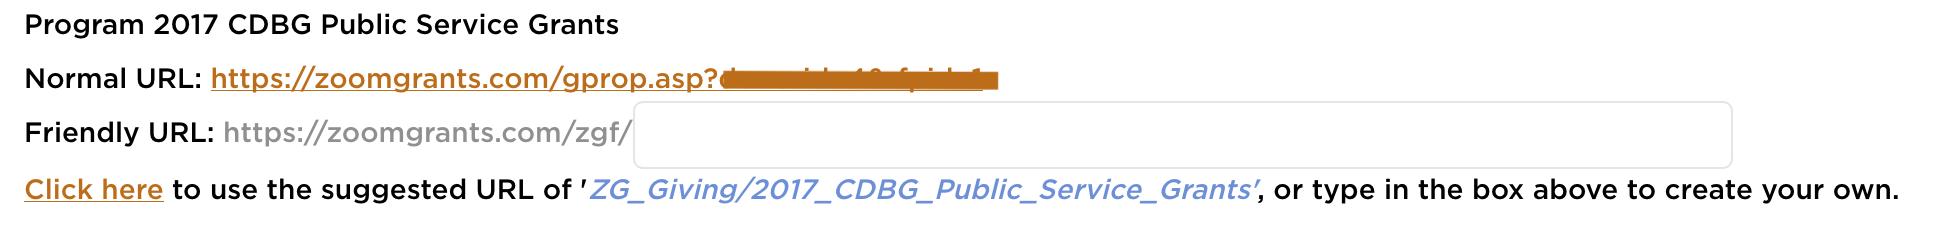 RFP/Program Friendly URL